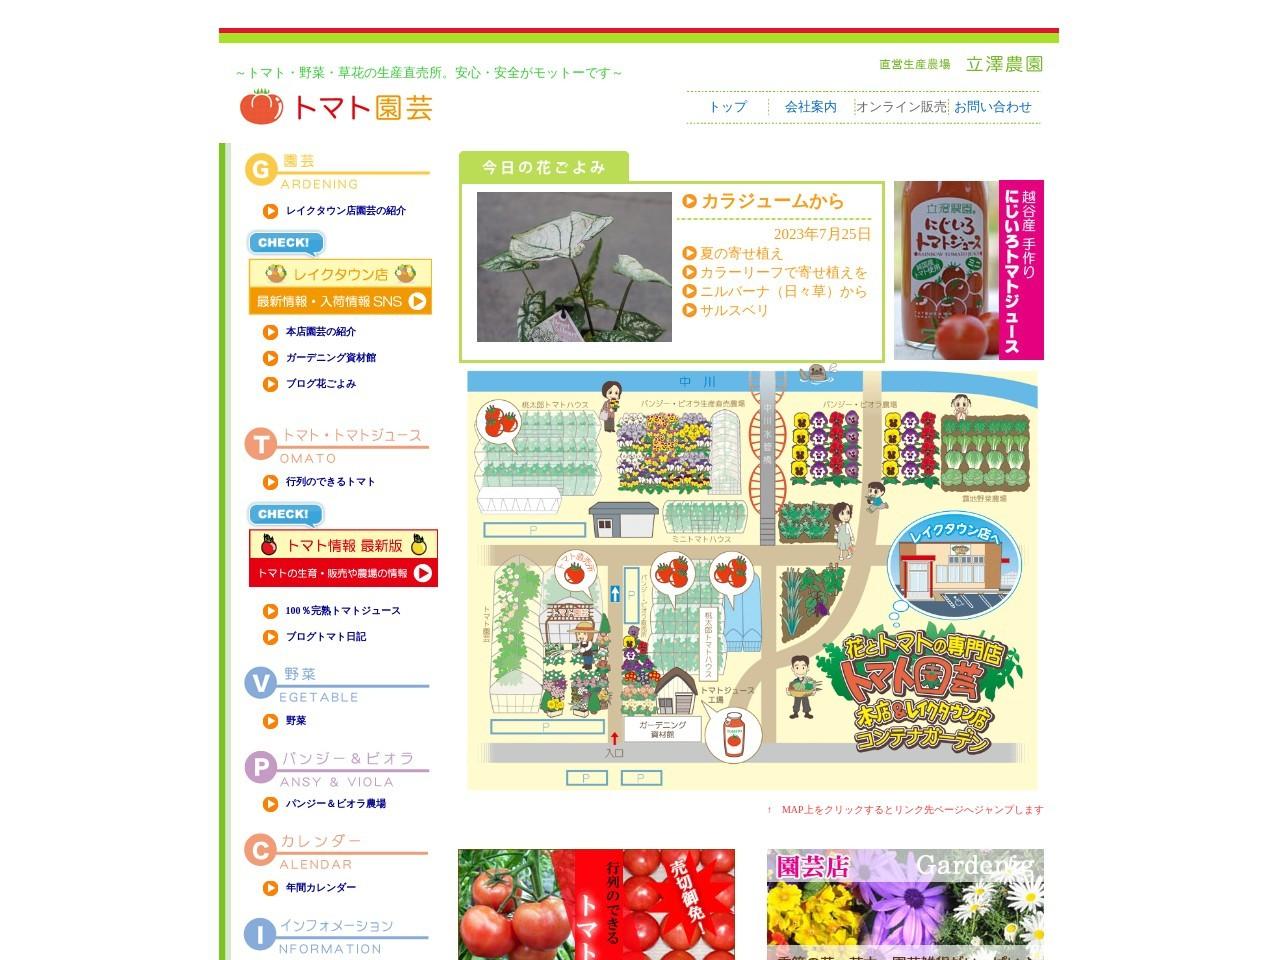 有限会社トマト園芸/本店